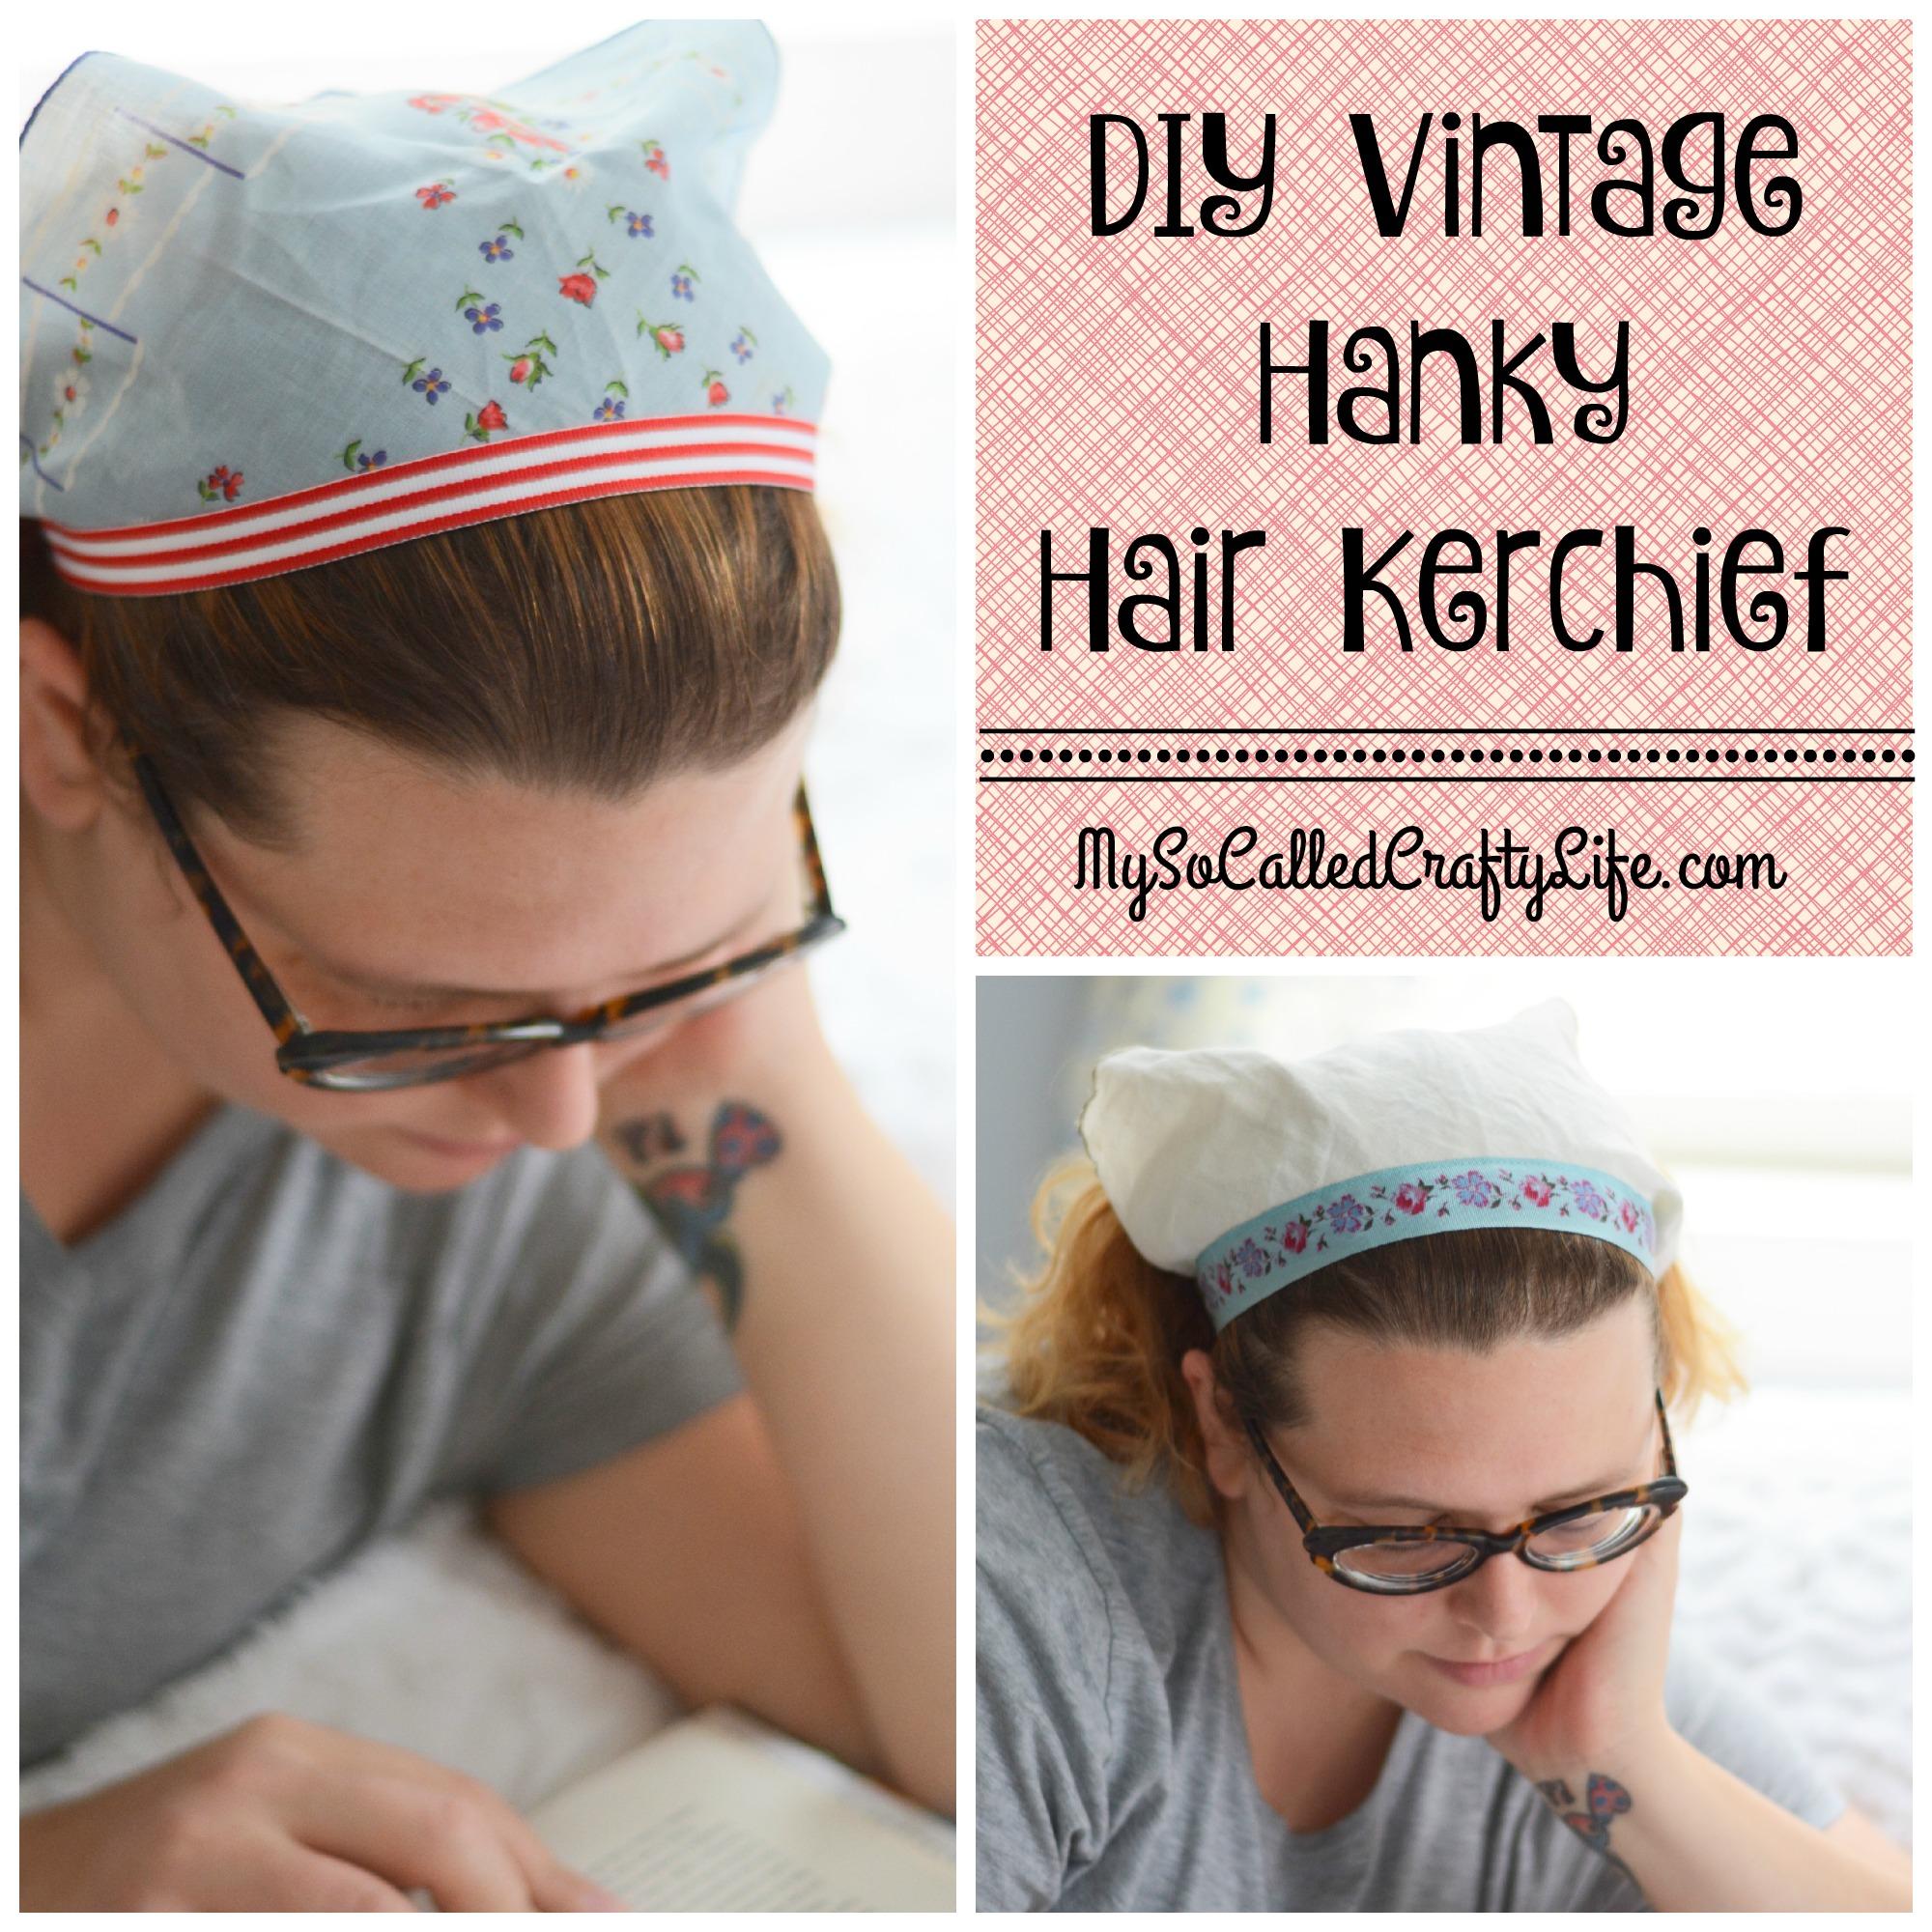 Kitschmas Gifts- DIY Vintage Hanky Hair Kerchief